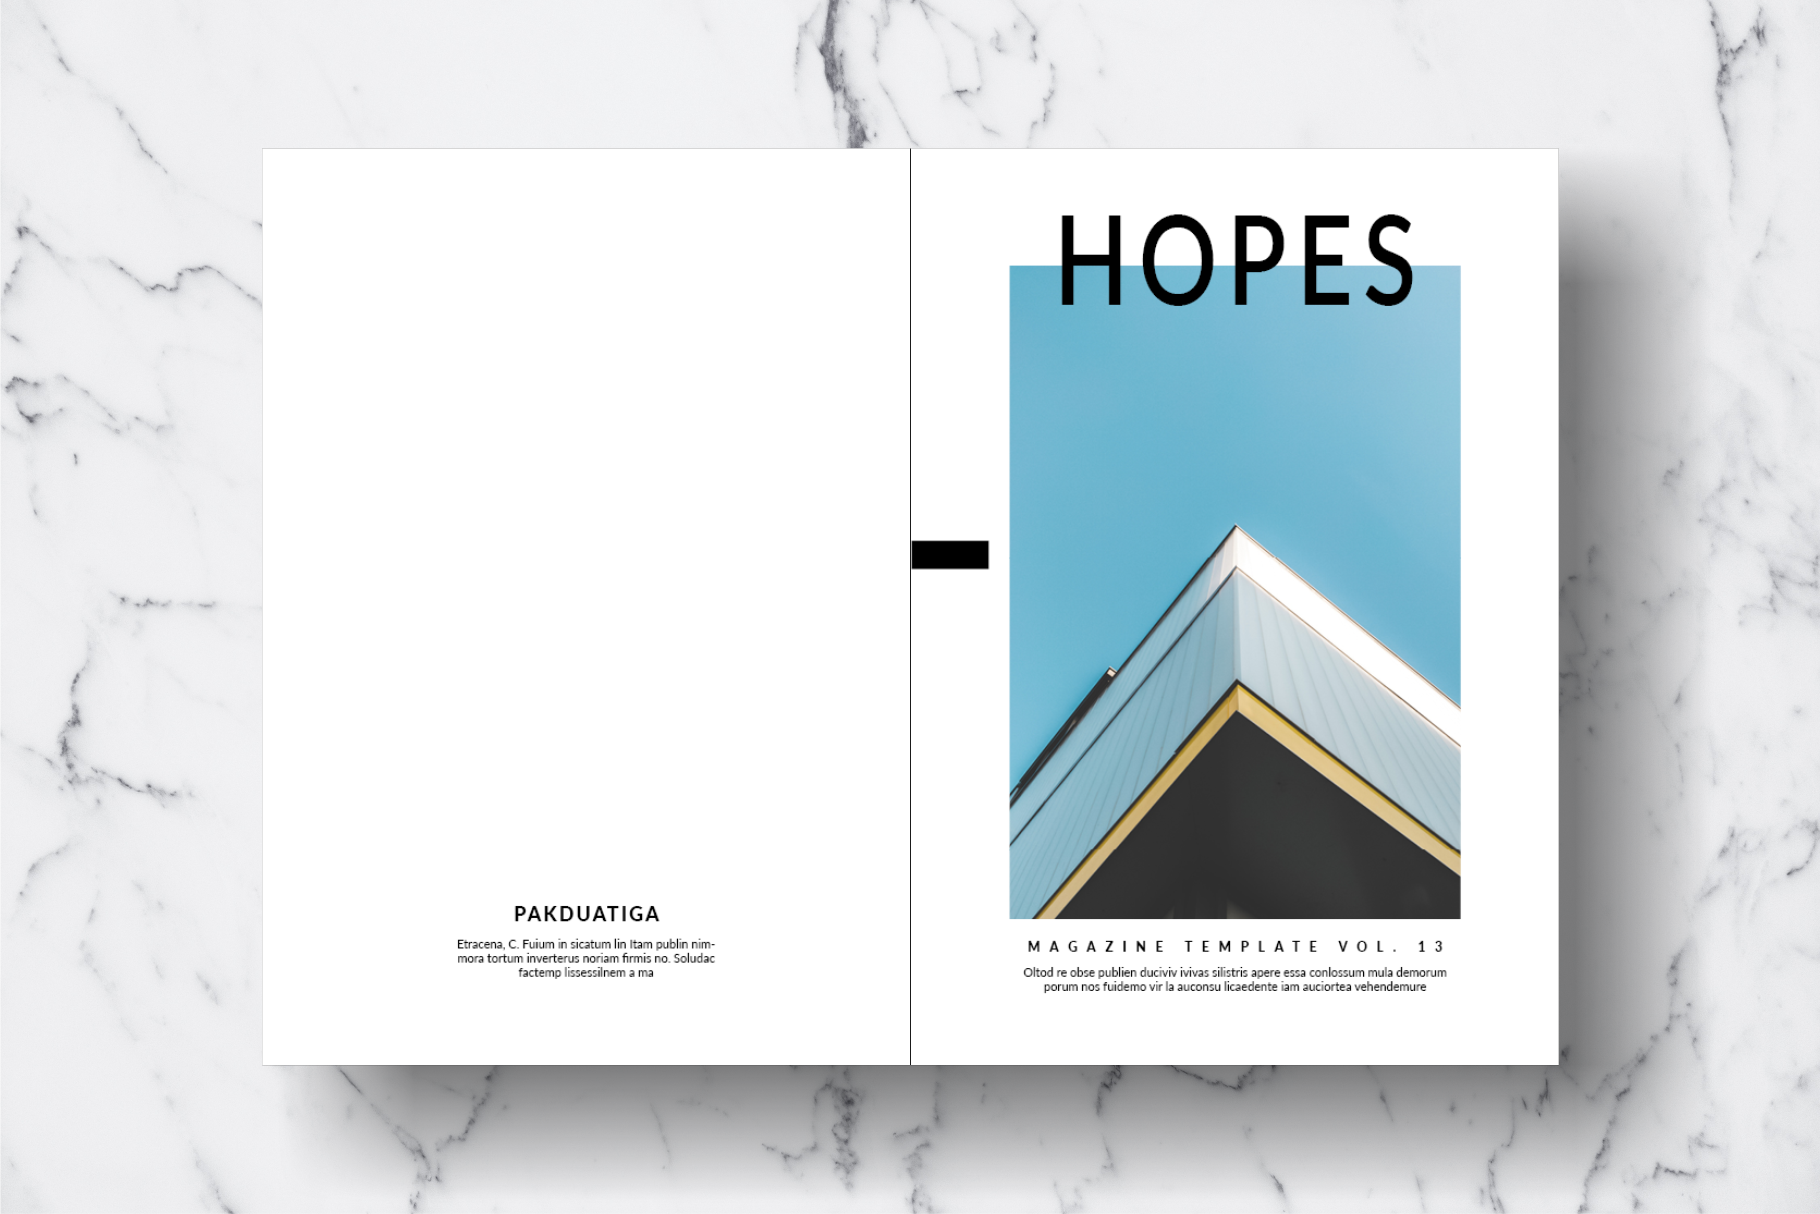 Magazine Template Vol. 13 example image 17